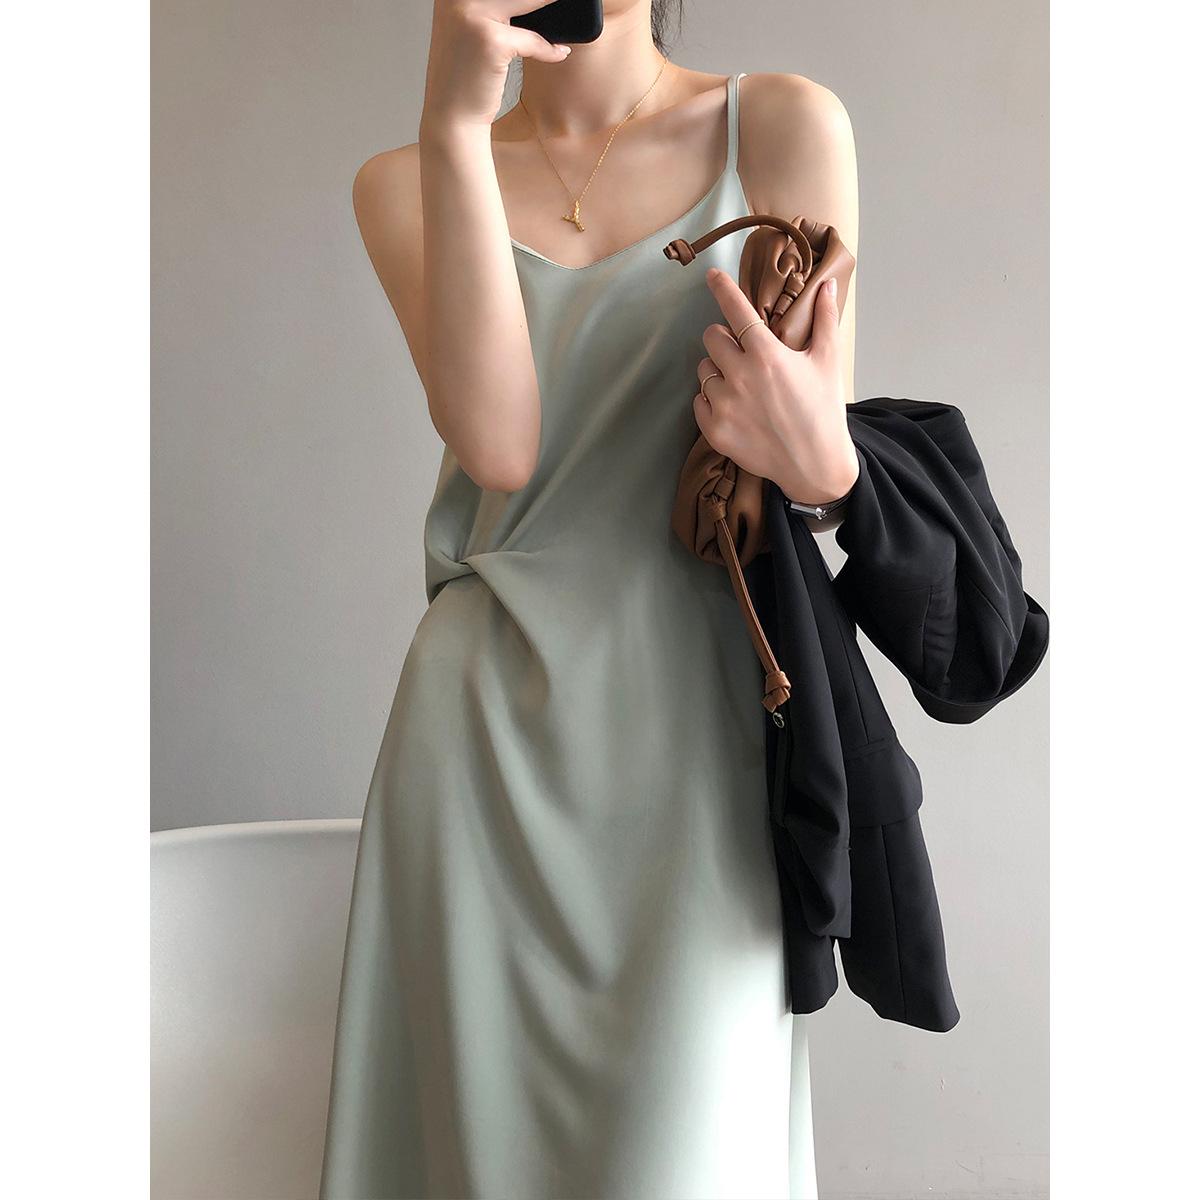 Yanshuang French Retro Sling Dress Women's Fall 2021 Satin Thin Strap Mid-length Skirt